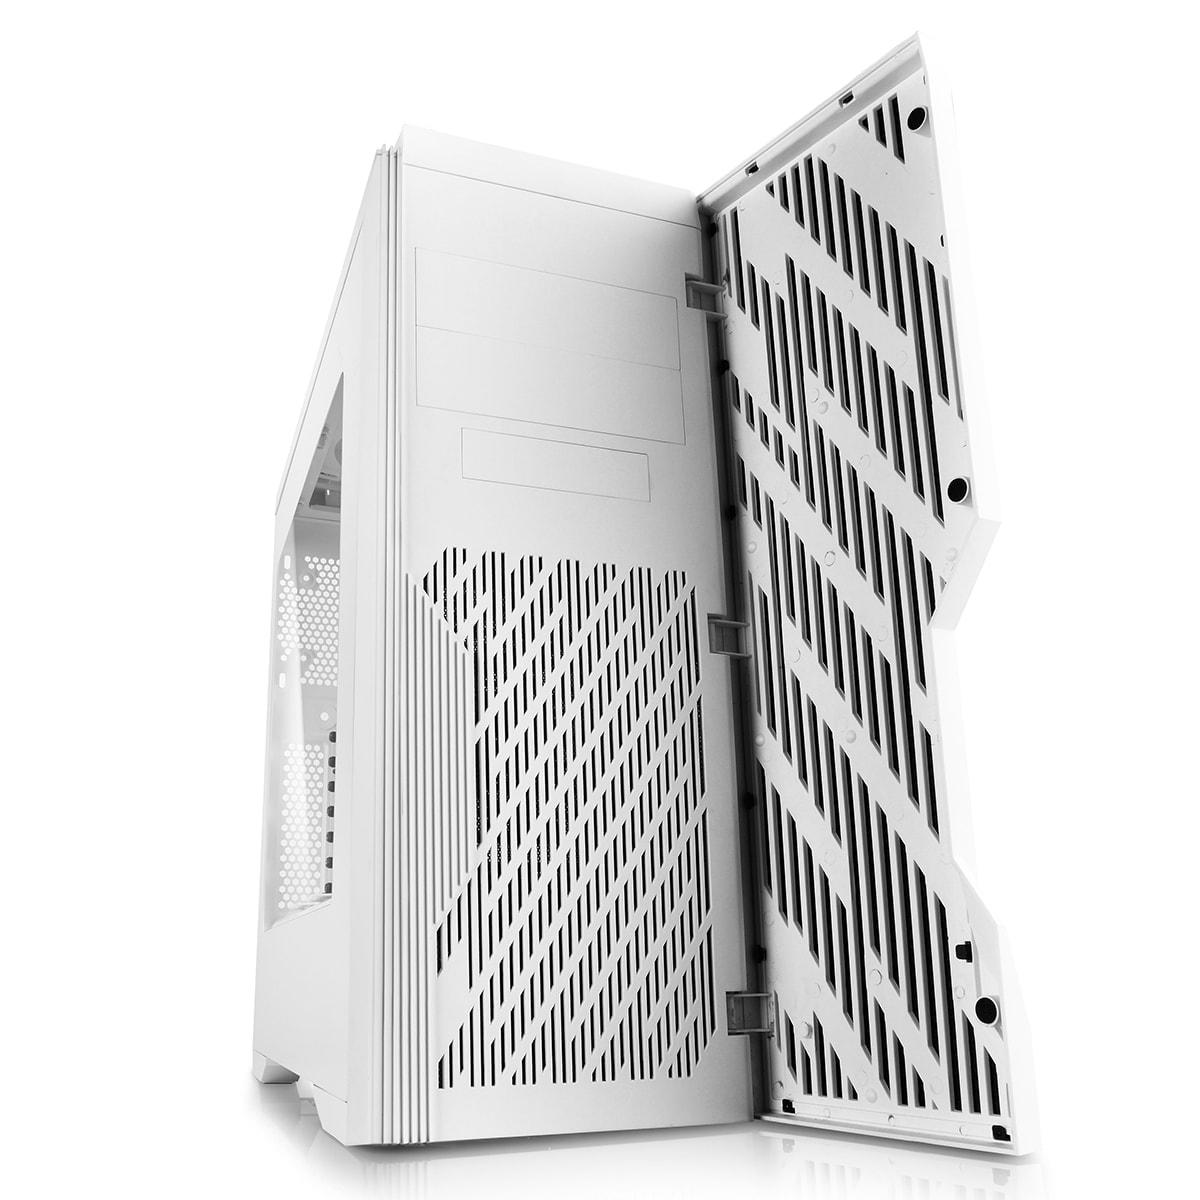 Deepcool DUKASE V2 Blanc - mT/Ss Alim/ATX (DUKASE WHV2) - Achat / Vente Boîtier PC sur Cybertek.fr - 1